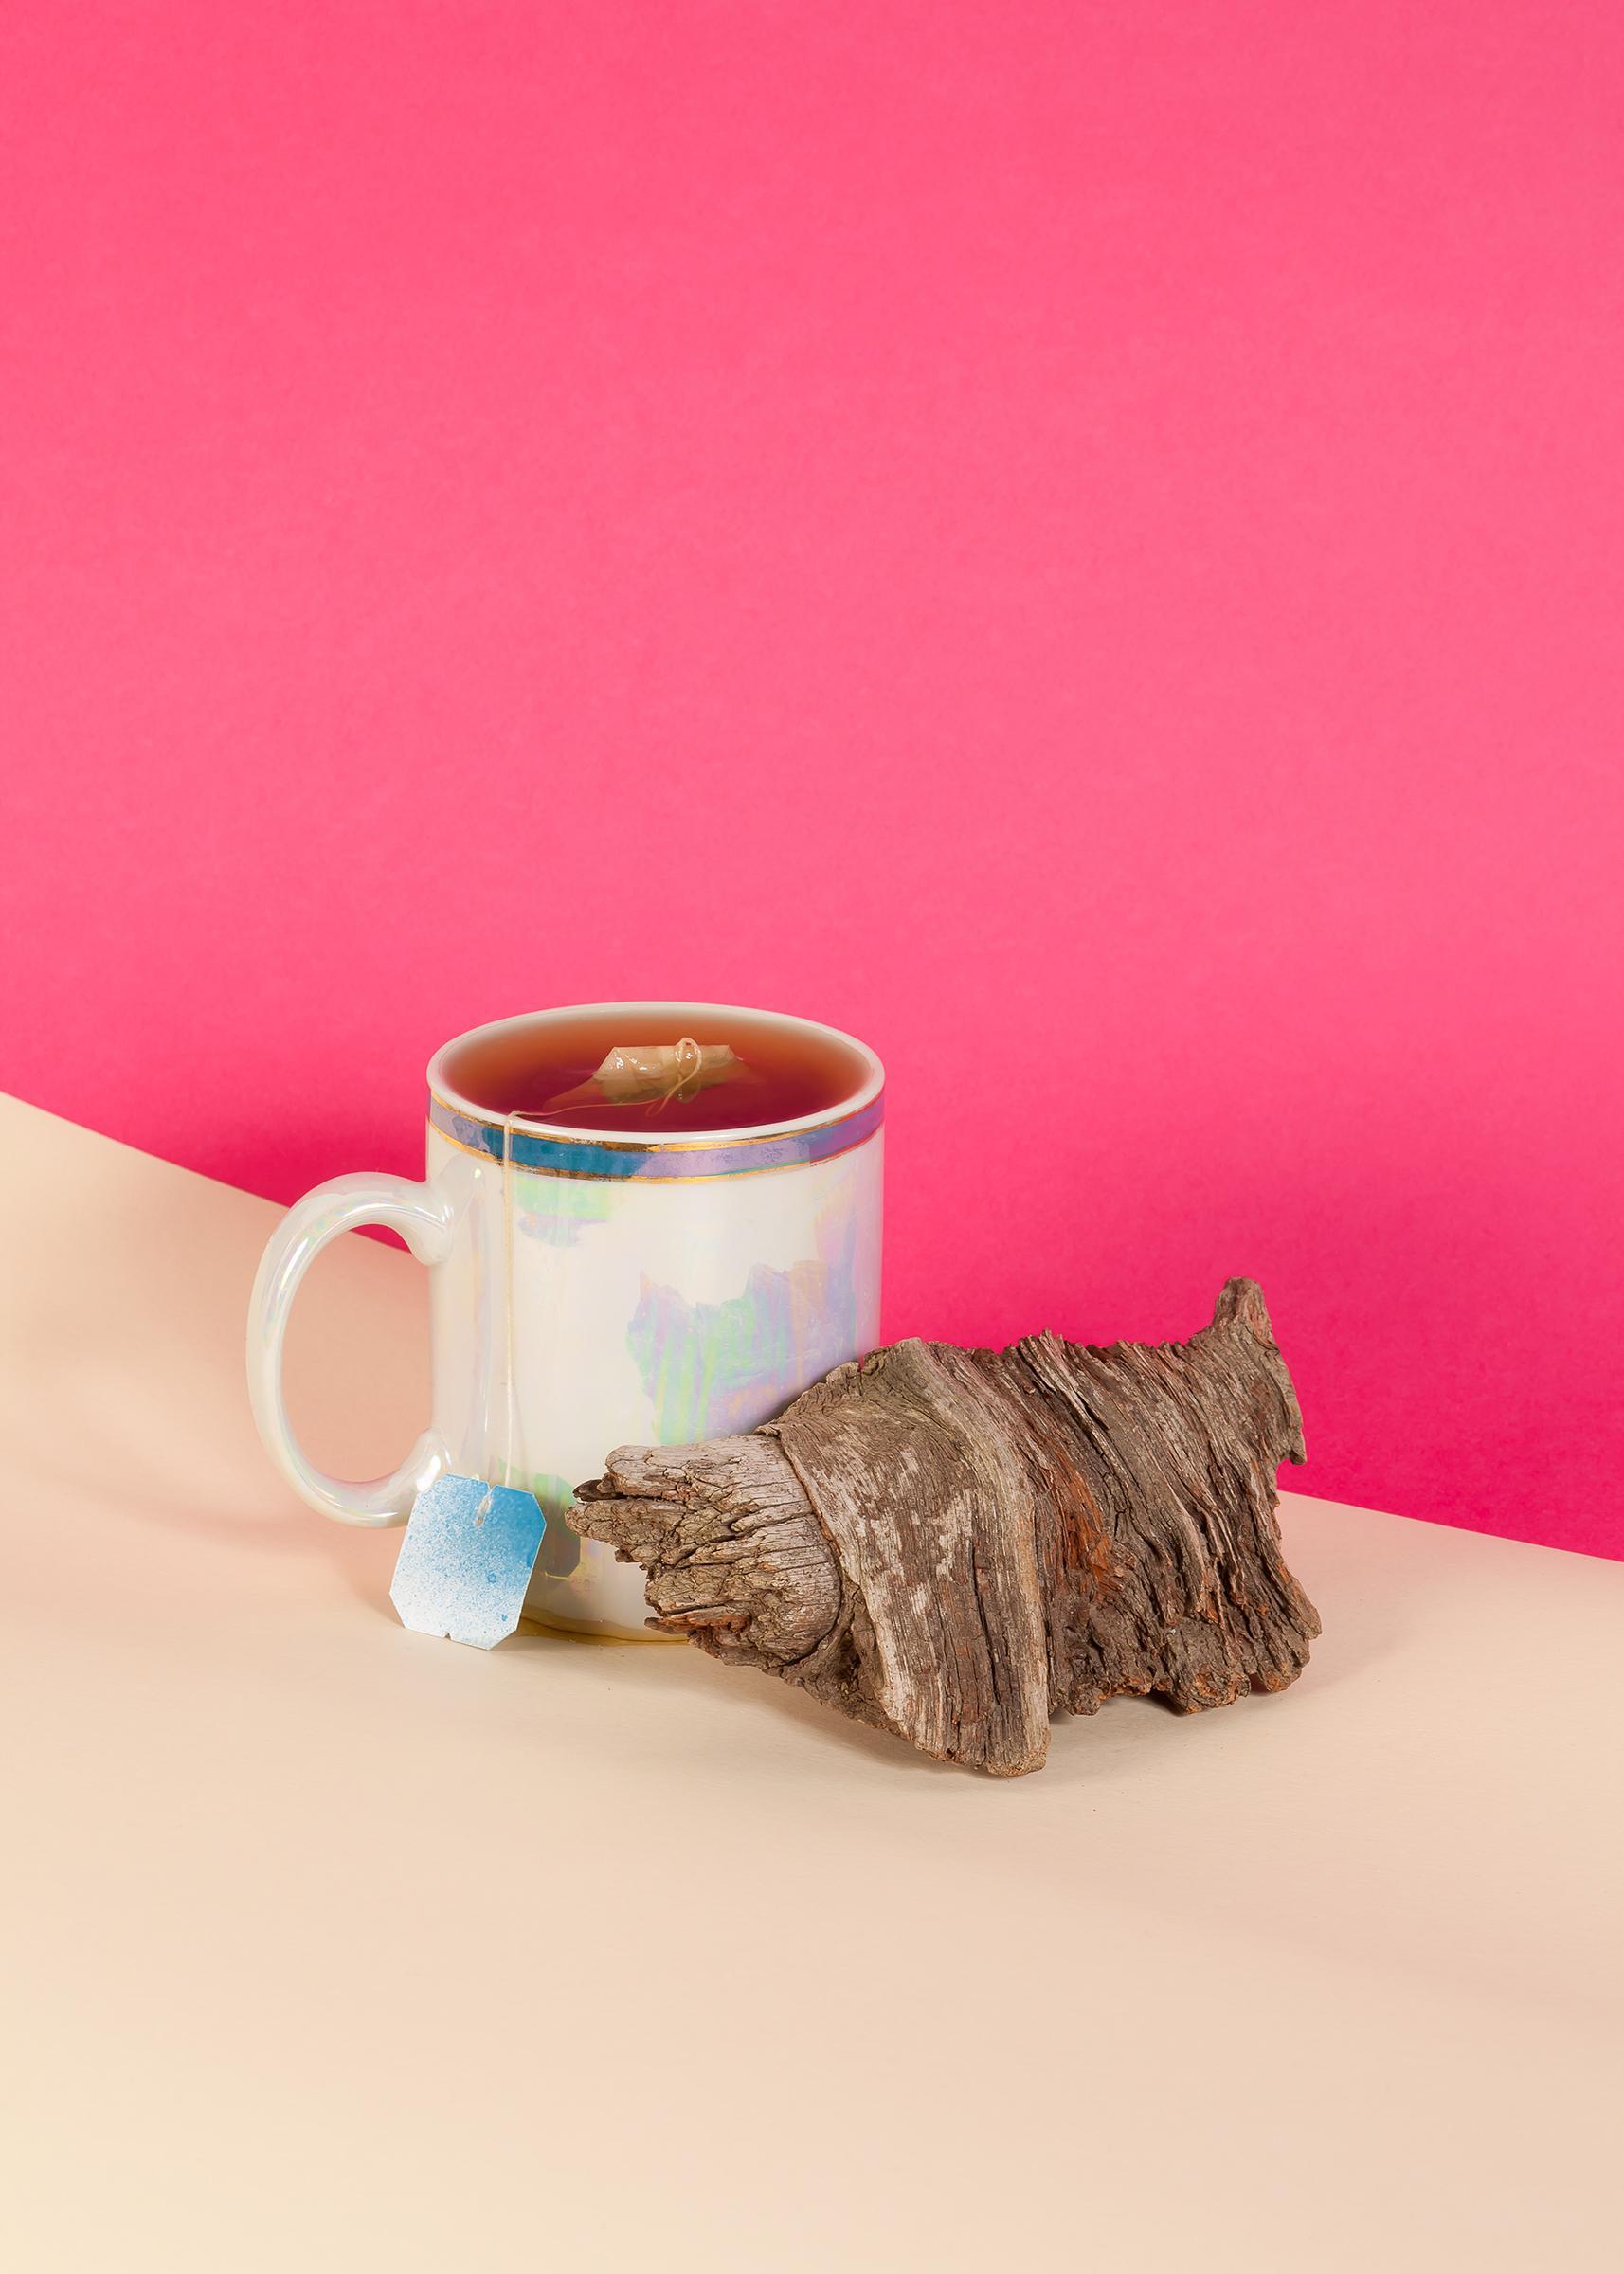 Modern Traditional Still Life Scene, Limited Edition Giclée, Retro Pastel